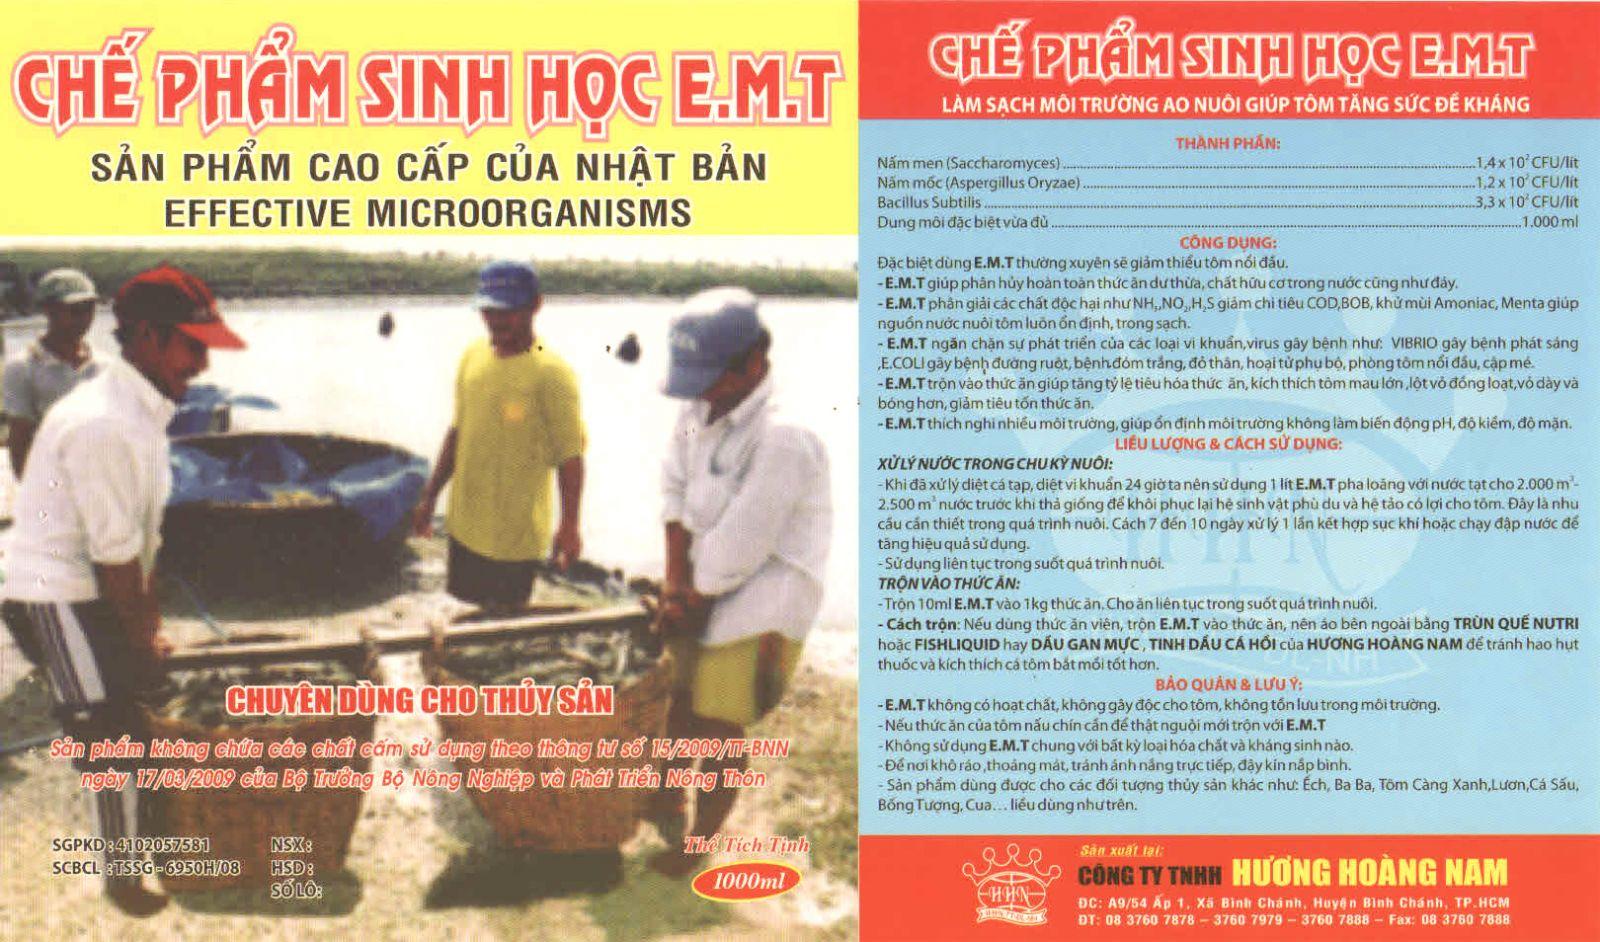 THUỐC THỦY SẢN - CHẾ PHẨM SINH HỌC EMT